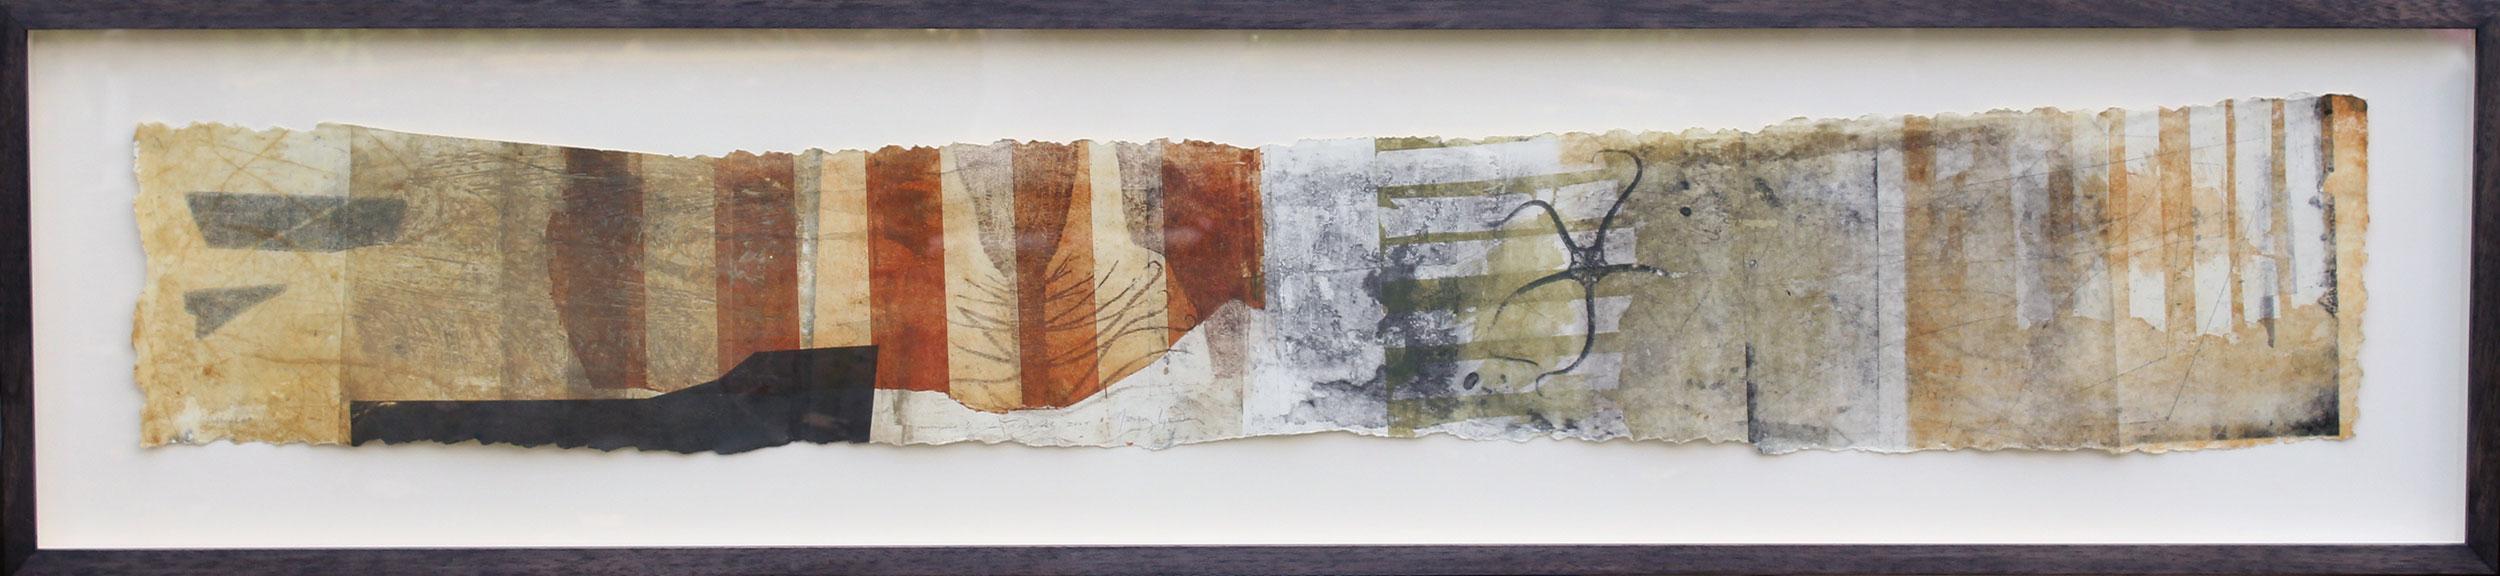 Golden Cap, Dorset, 2007, Intaglio Monoprint by Jeremy Gardiner